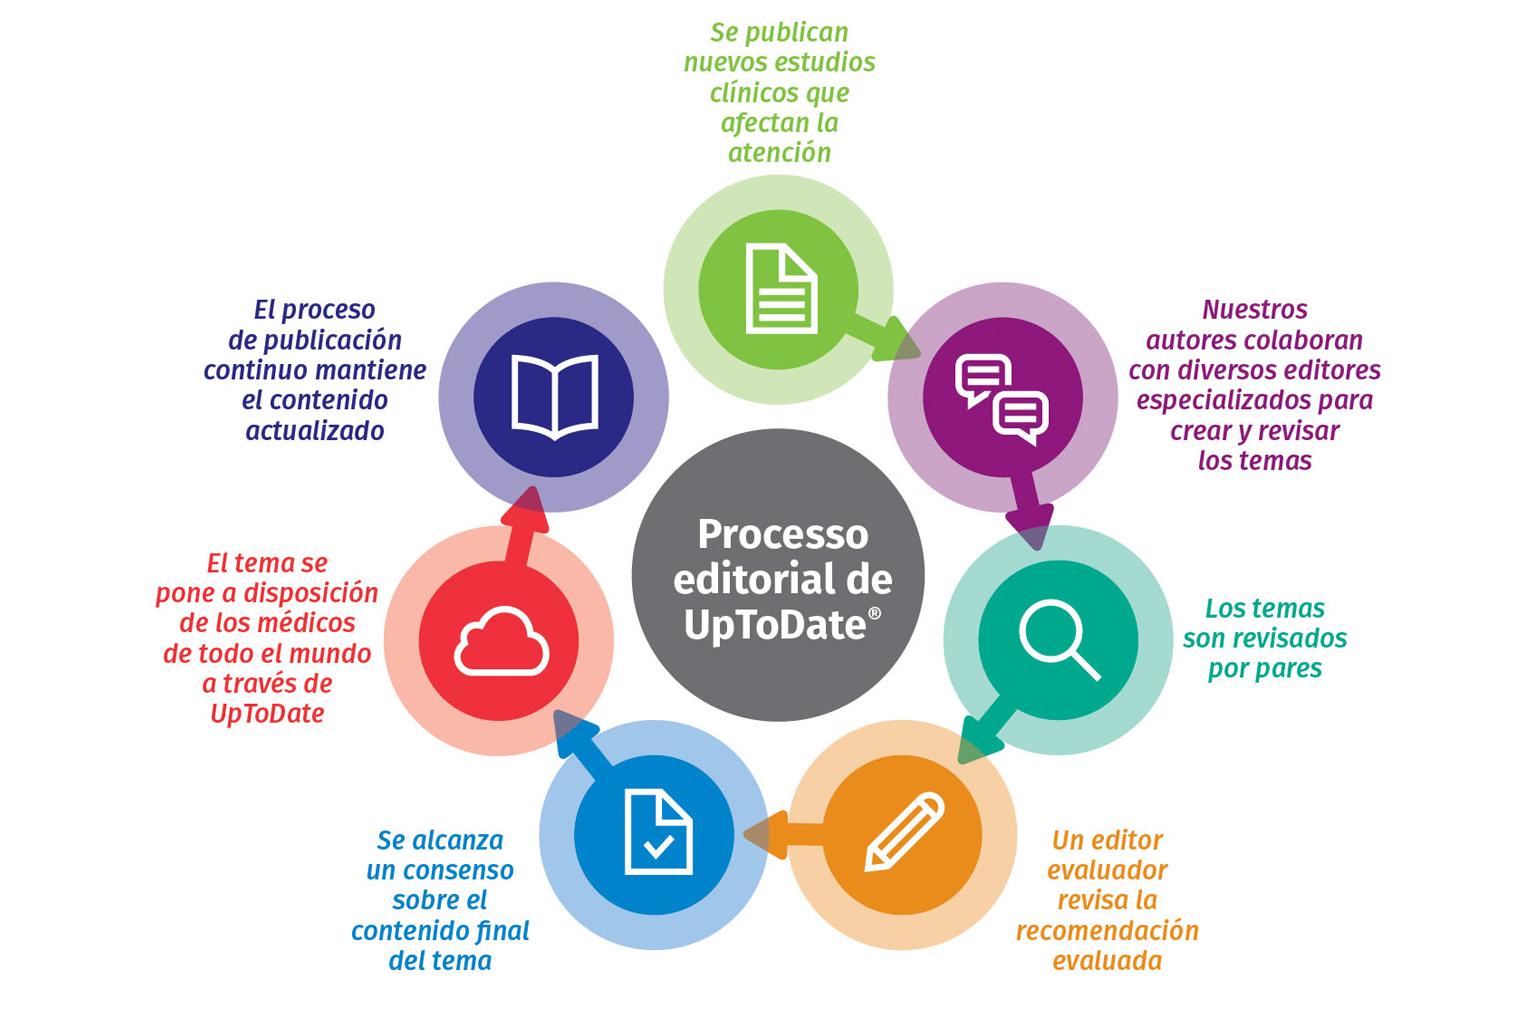 graphic-UTD-editorial-process-circular-ES-2X